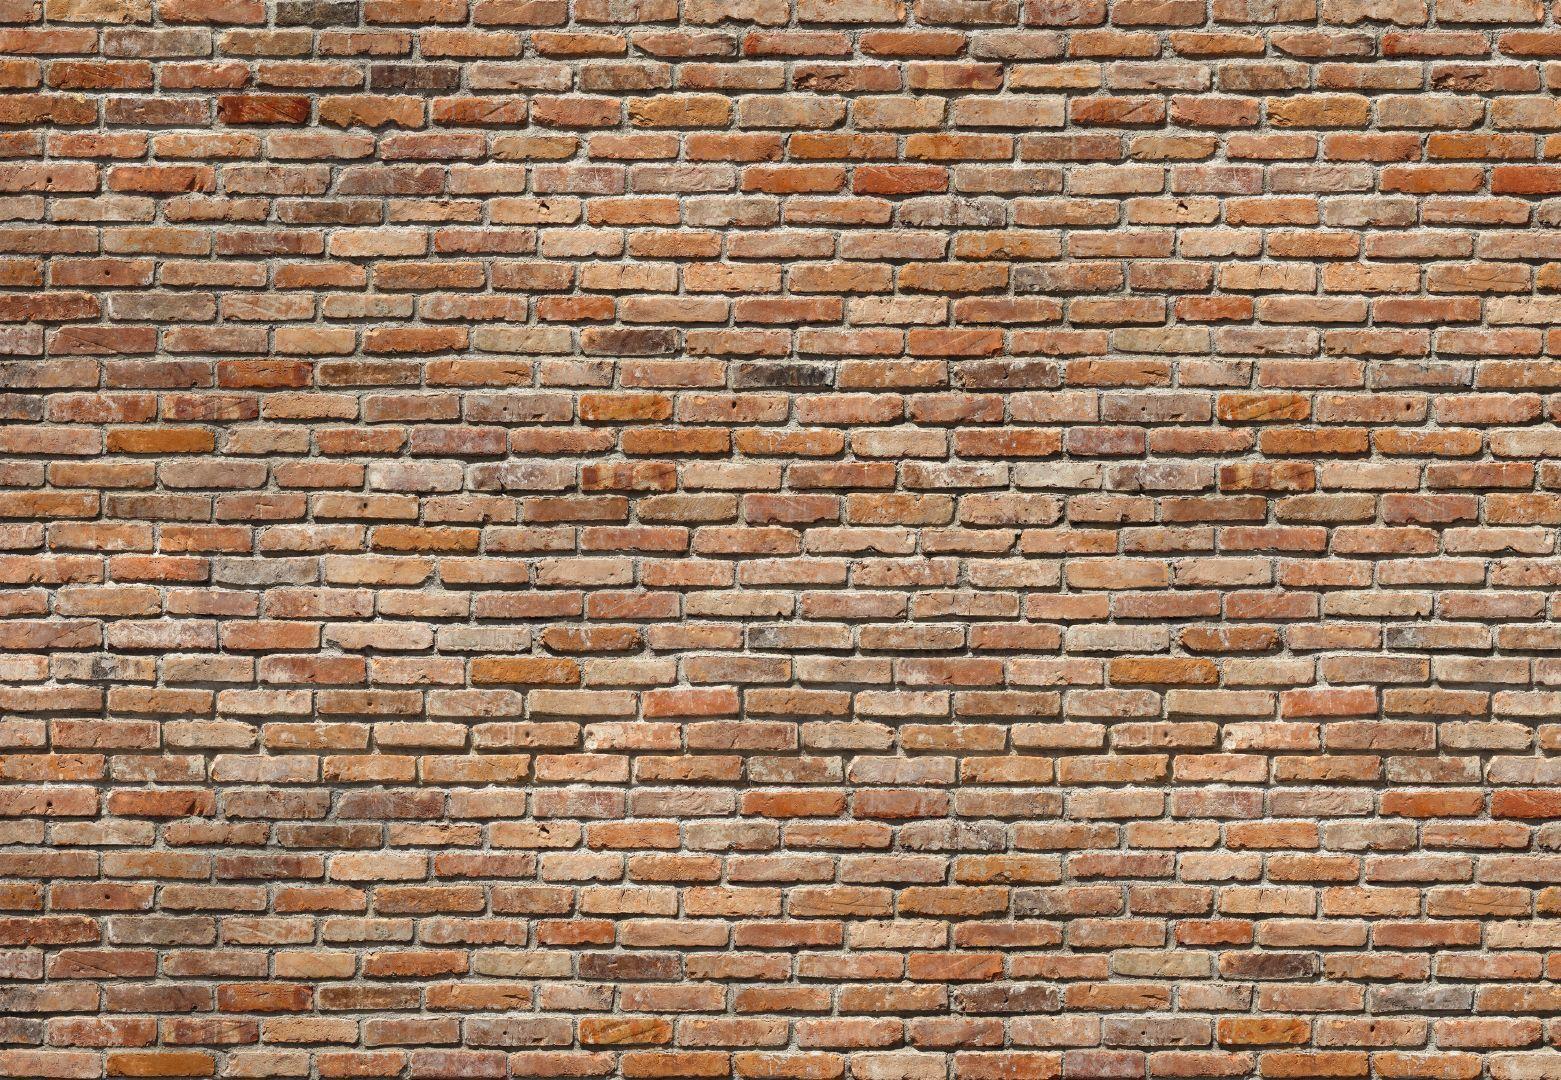 Poster fotomurale Komar - Muro Muro Muro in mattoni rossi (cod. 8-741) -  mis. 368x254 cm 901c6d